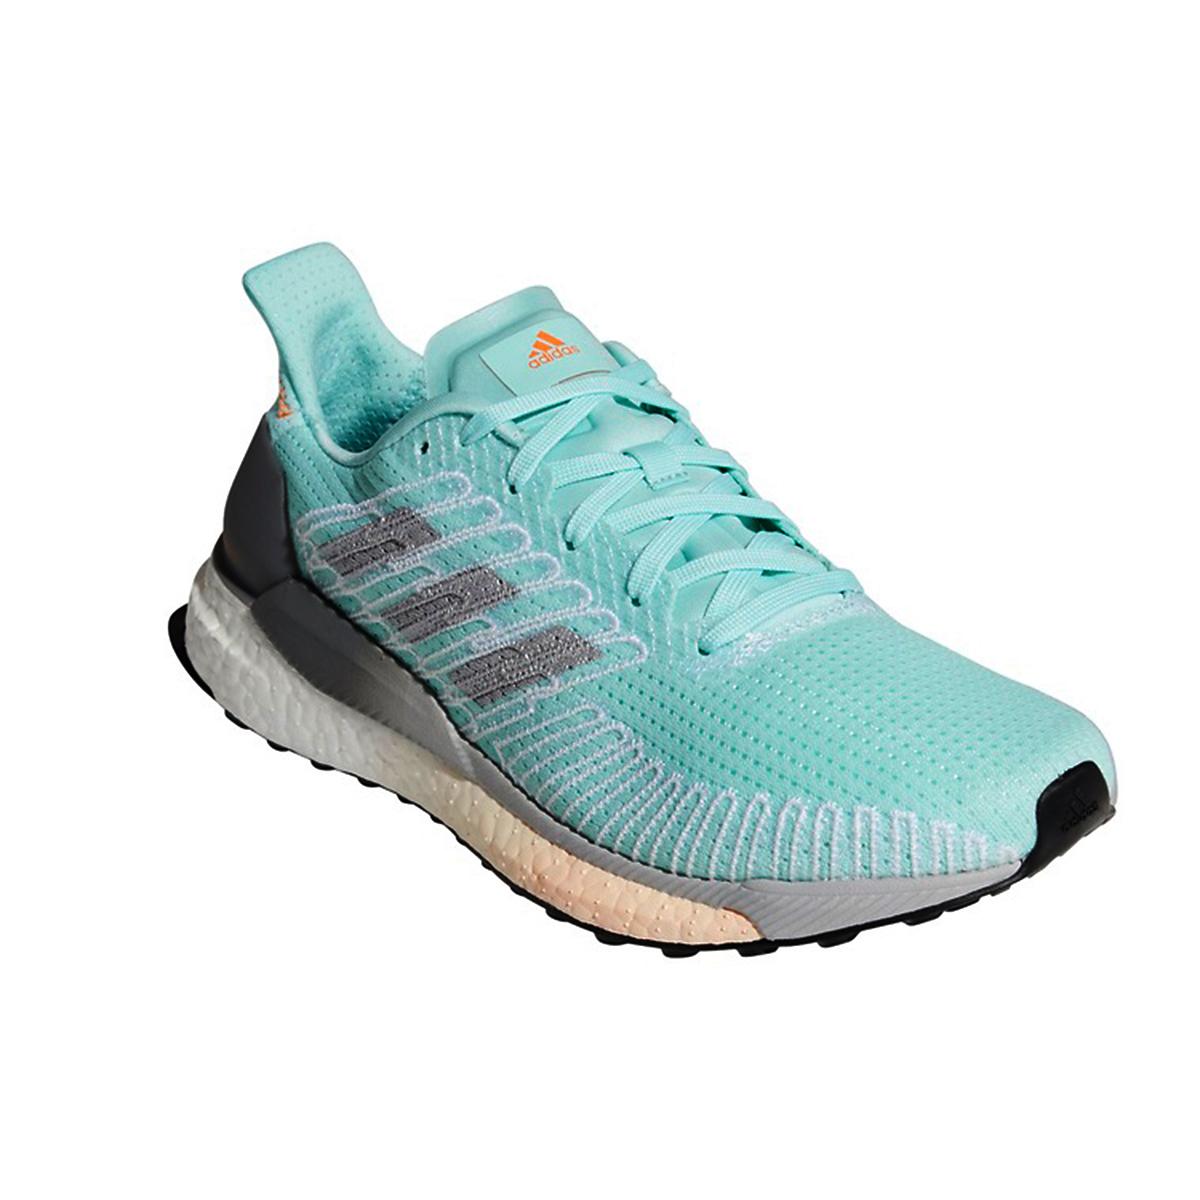 Women's Adidas SolarBOOST 19 Running Shoe - Color: Frost Mint/Silver Metallic/Grey - Size: 5 - Width: Regular, Frost Mint/Silver Metallic/Grey, large, image 3